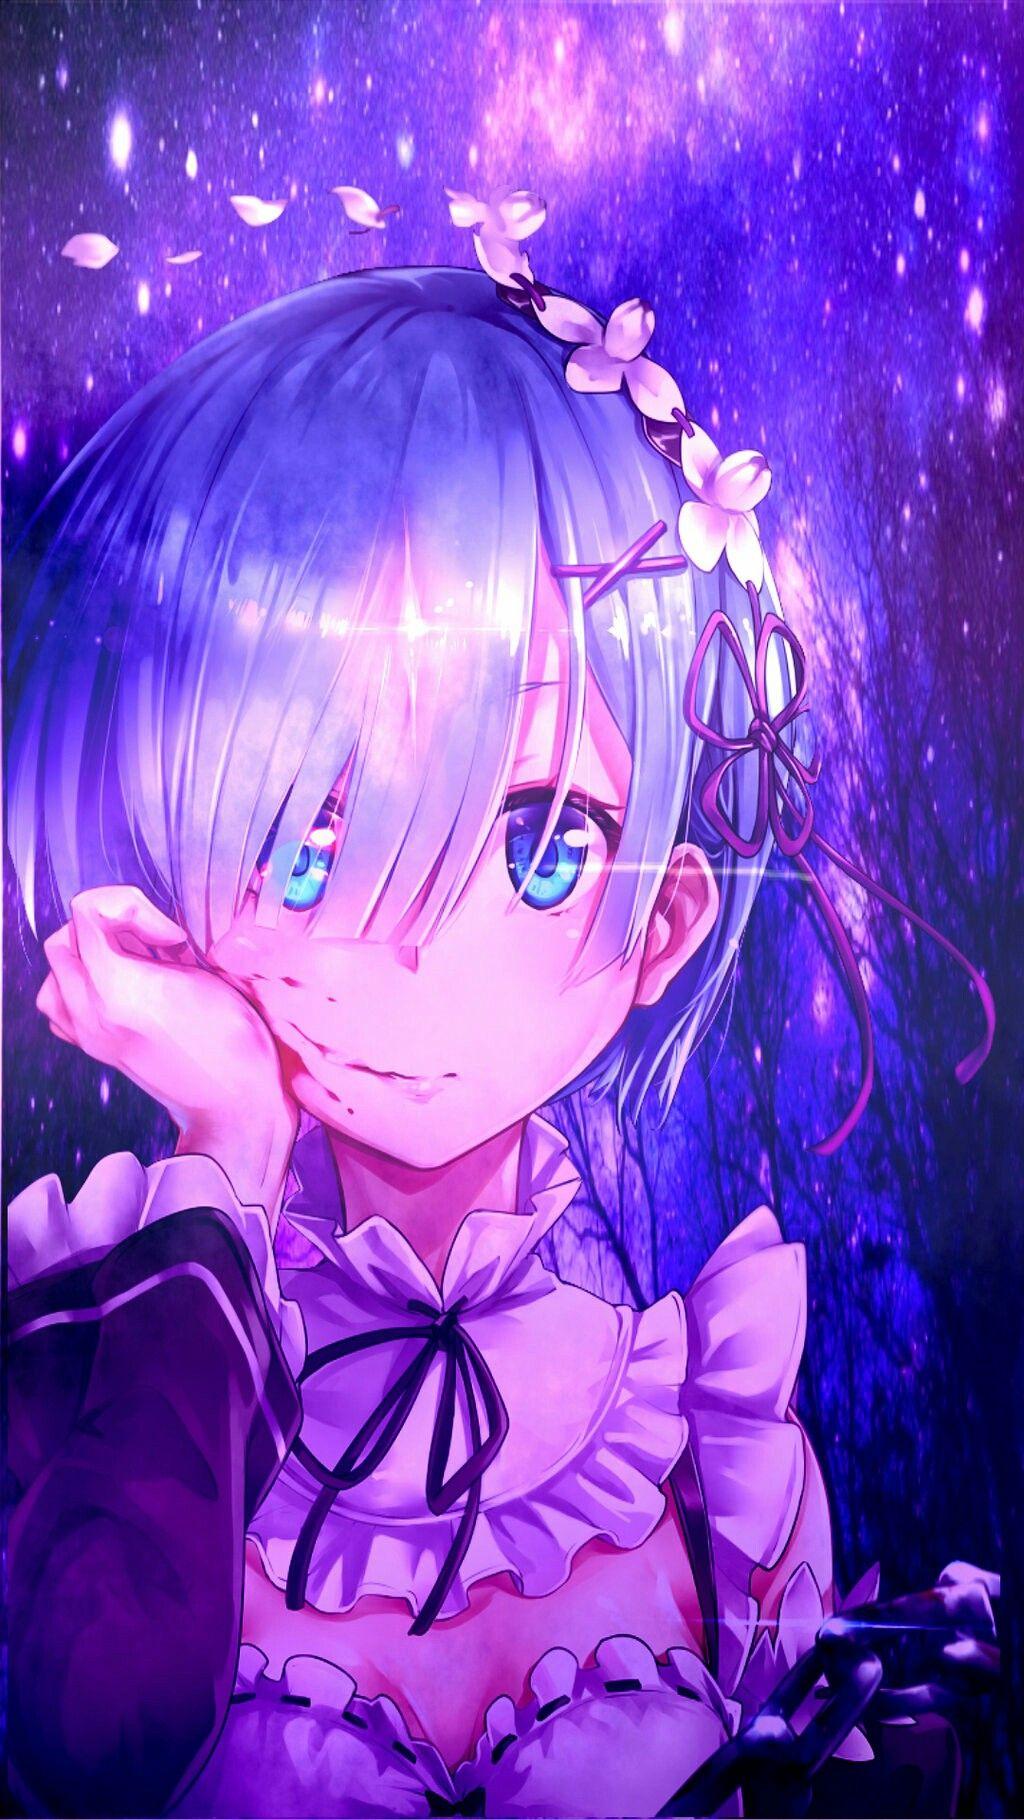 Rem ReZero (,,•﹏•,,)♡ in 2020 Anime art, Kawaii